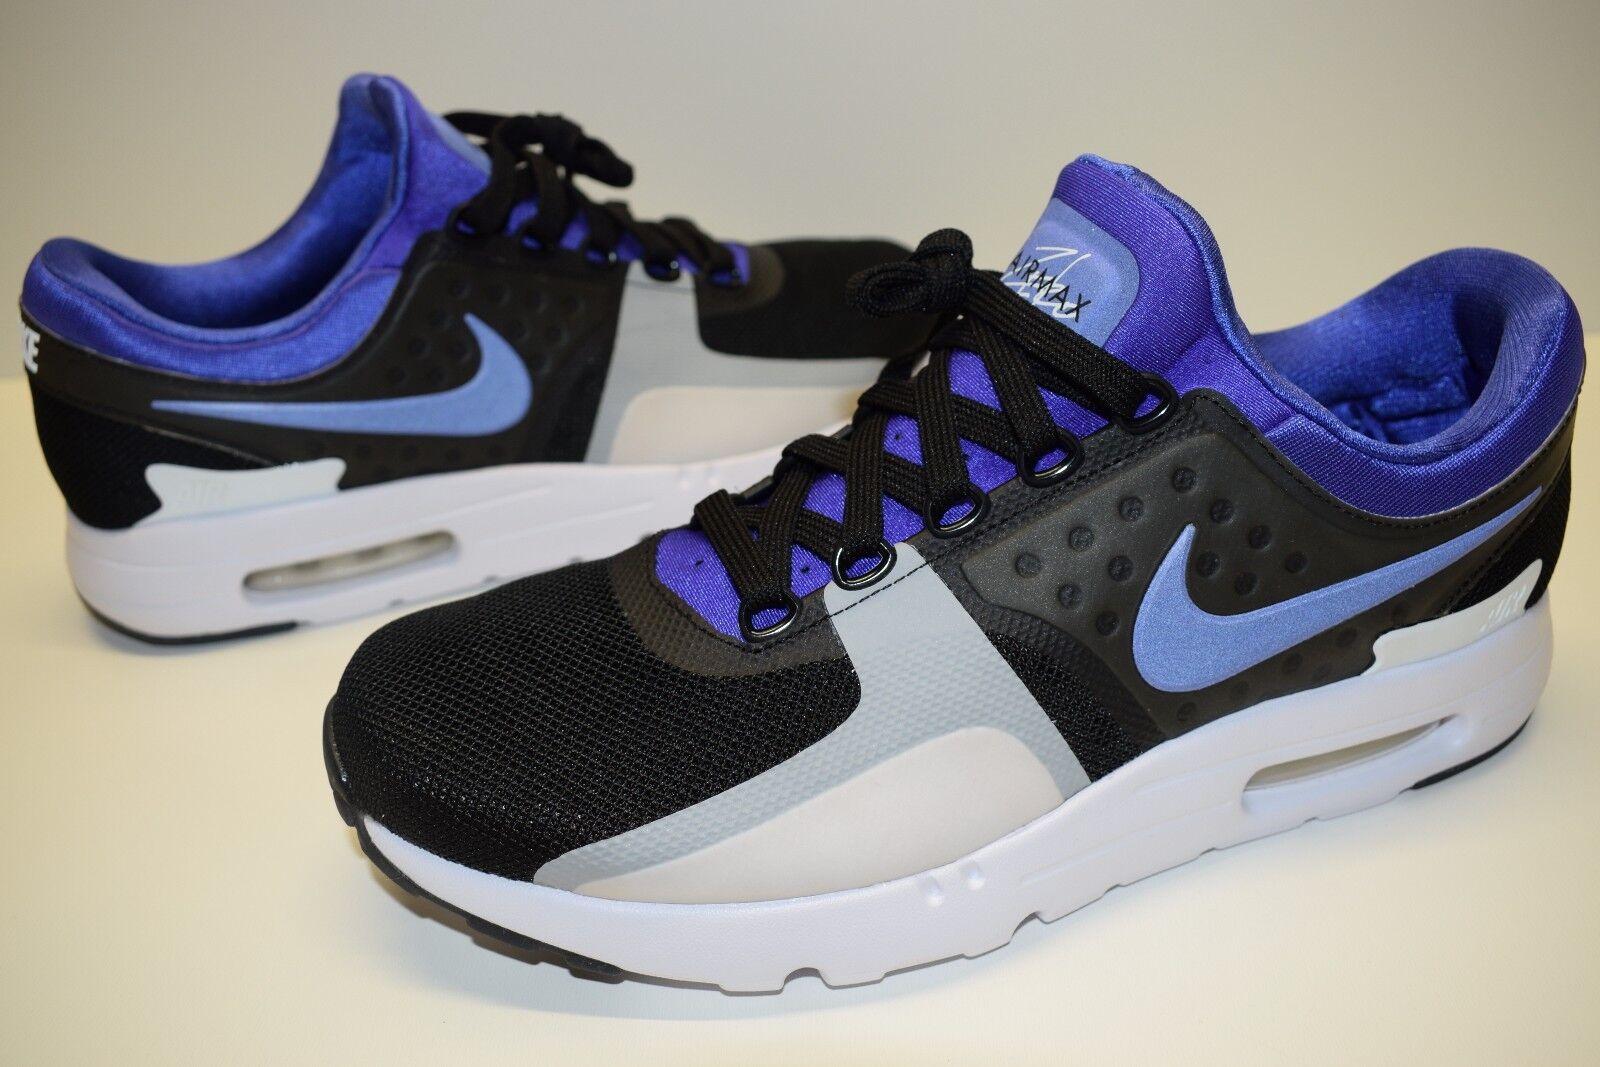 Nike Air Max Zero QS homme Shoe Sneaker 789695 004 Sz US 9.5 EU 43 NEW